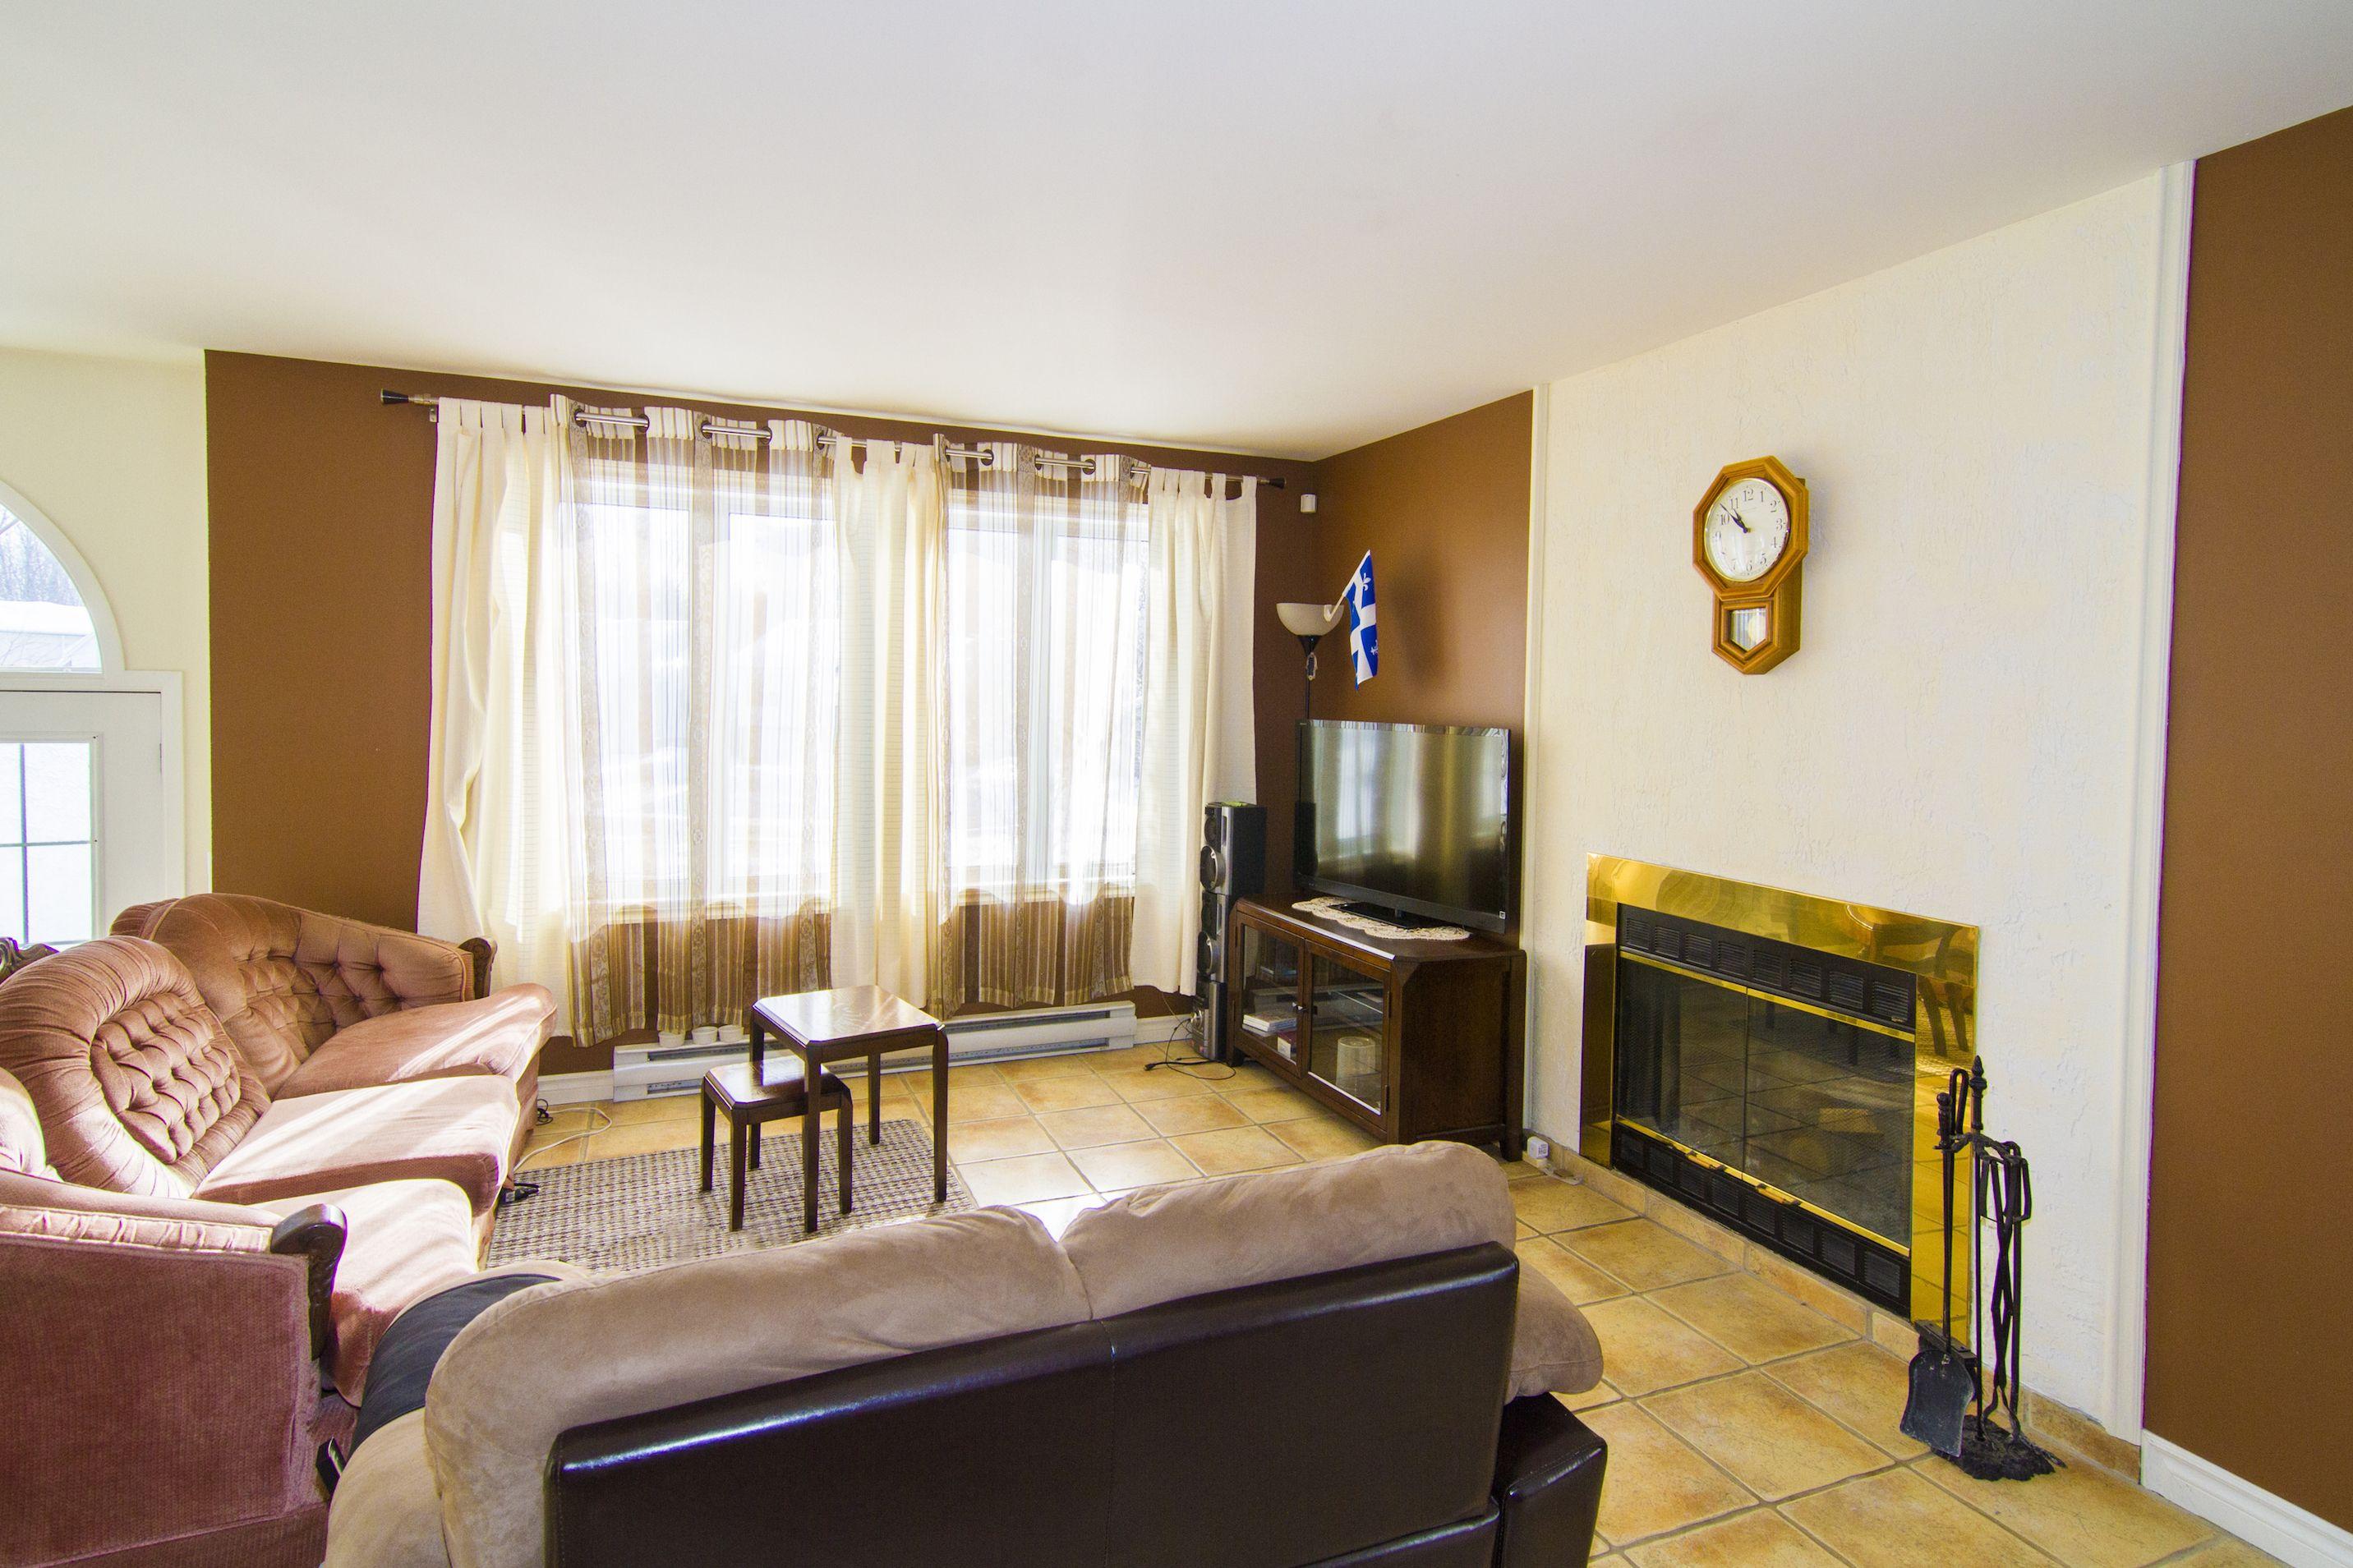 www.amazon.com/PrestigePaints | Room decor, Living room ...